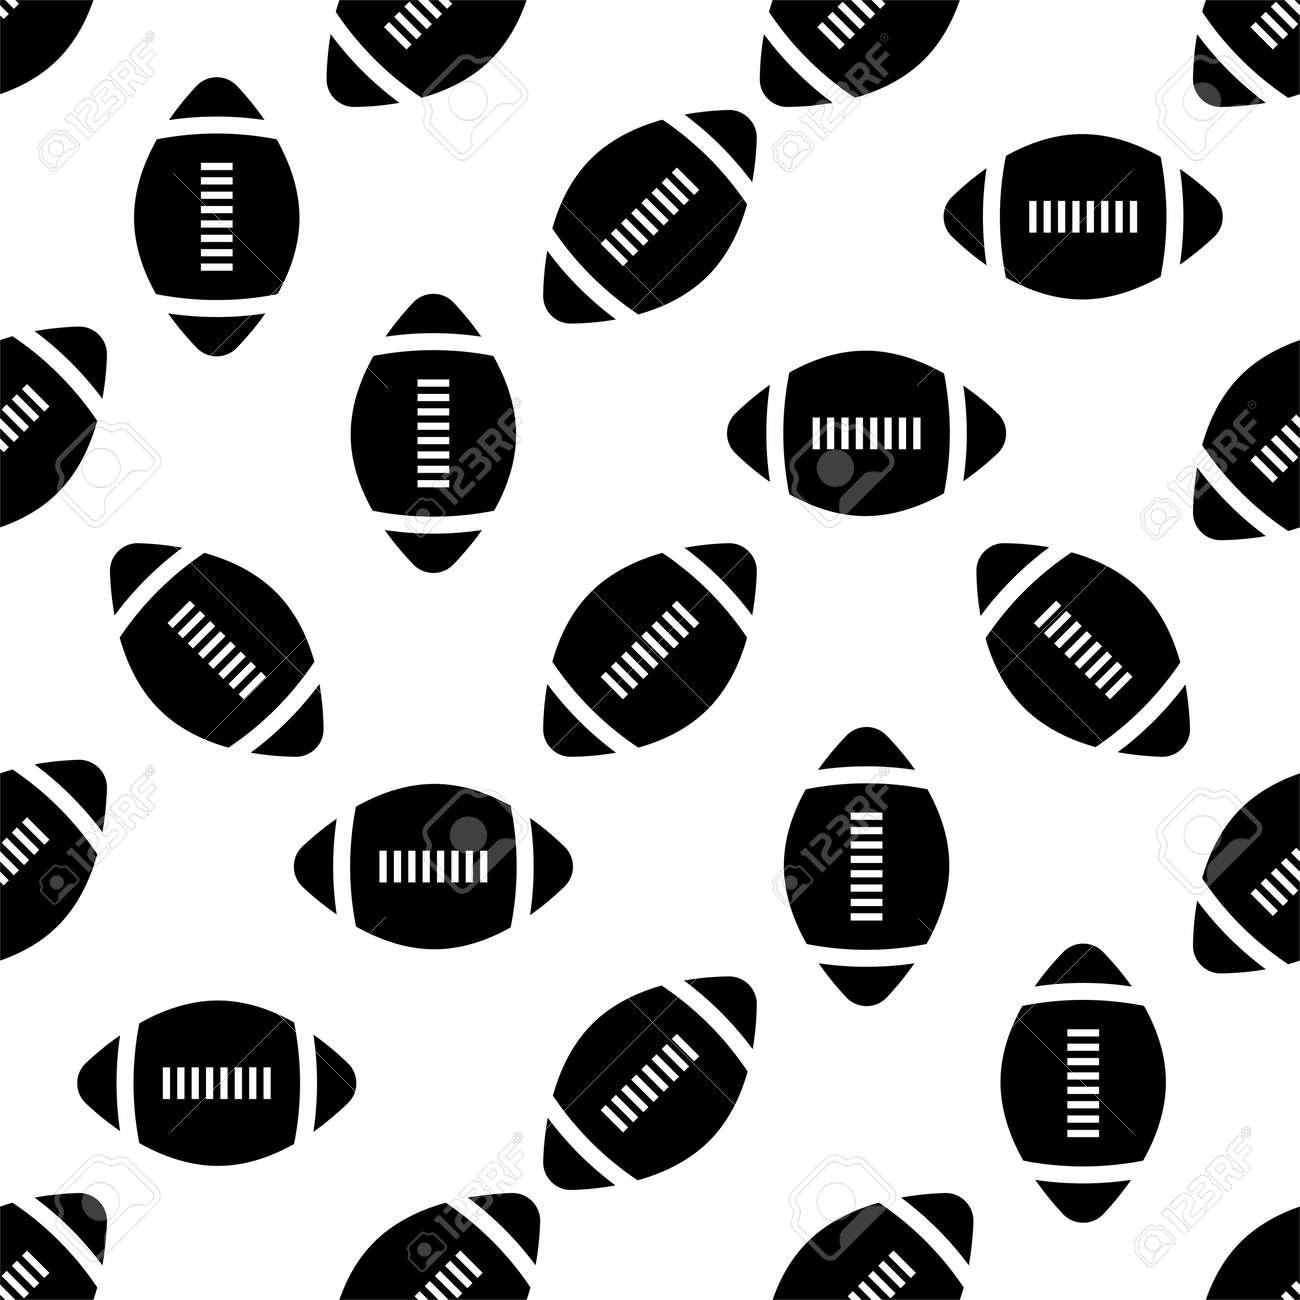 American Football Icon Seamless Pattern, Soccer Ball Seamless Pattern Vector Art Illustration - 149571159